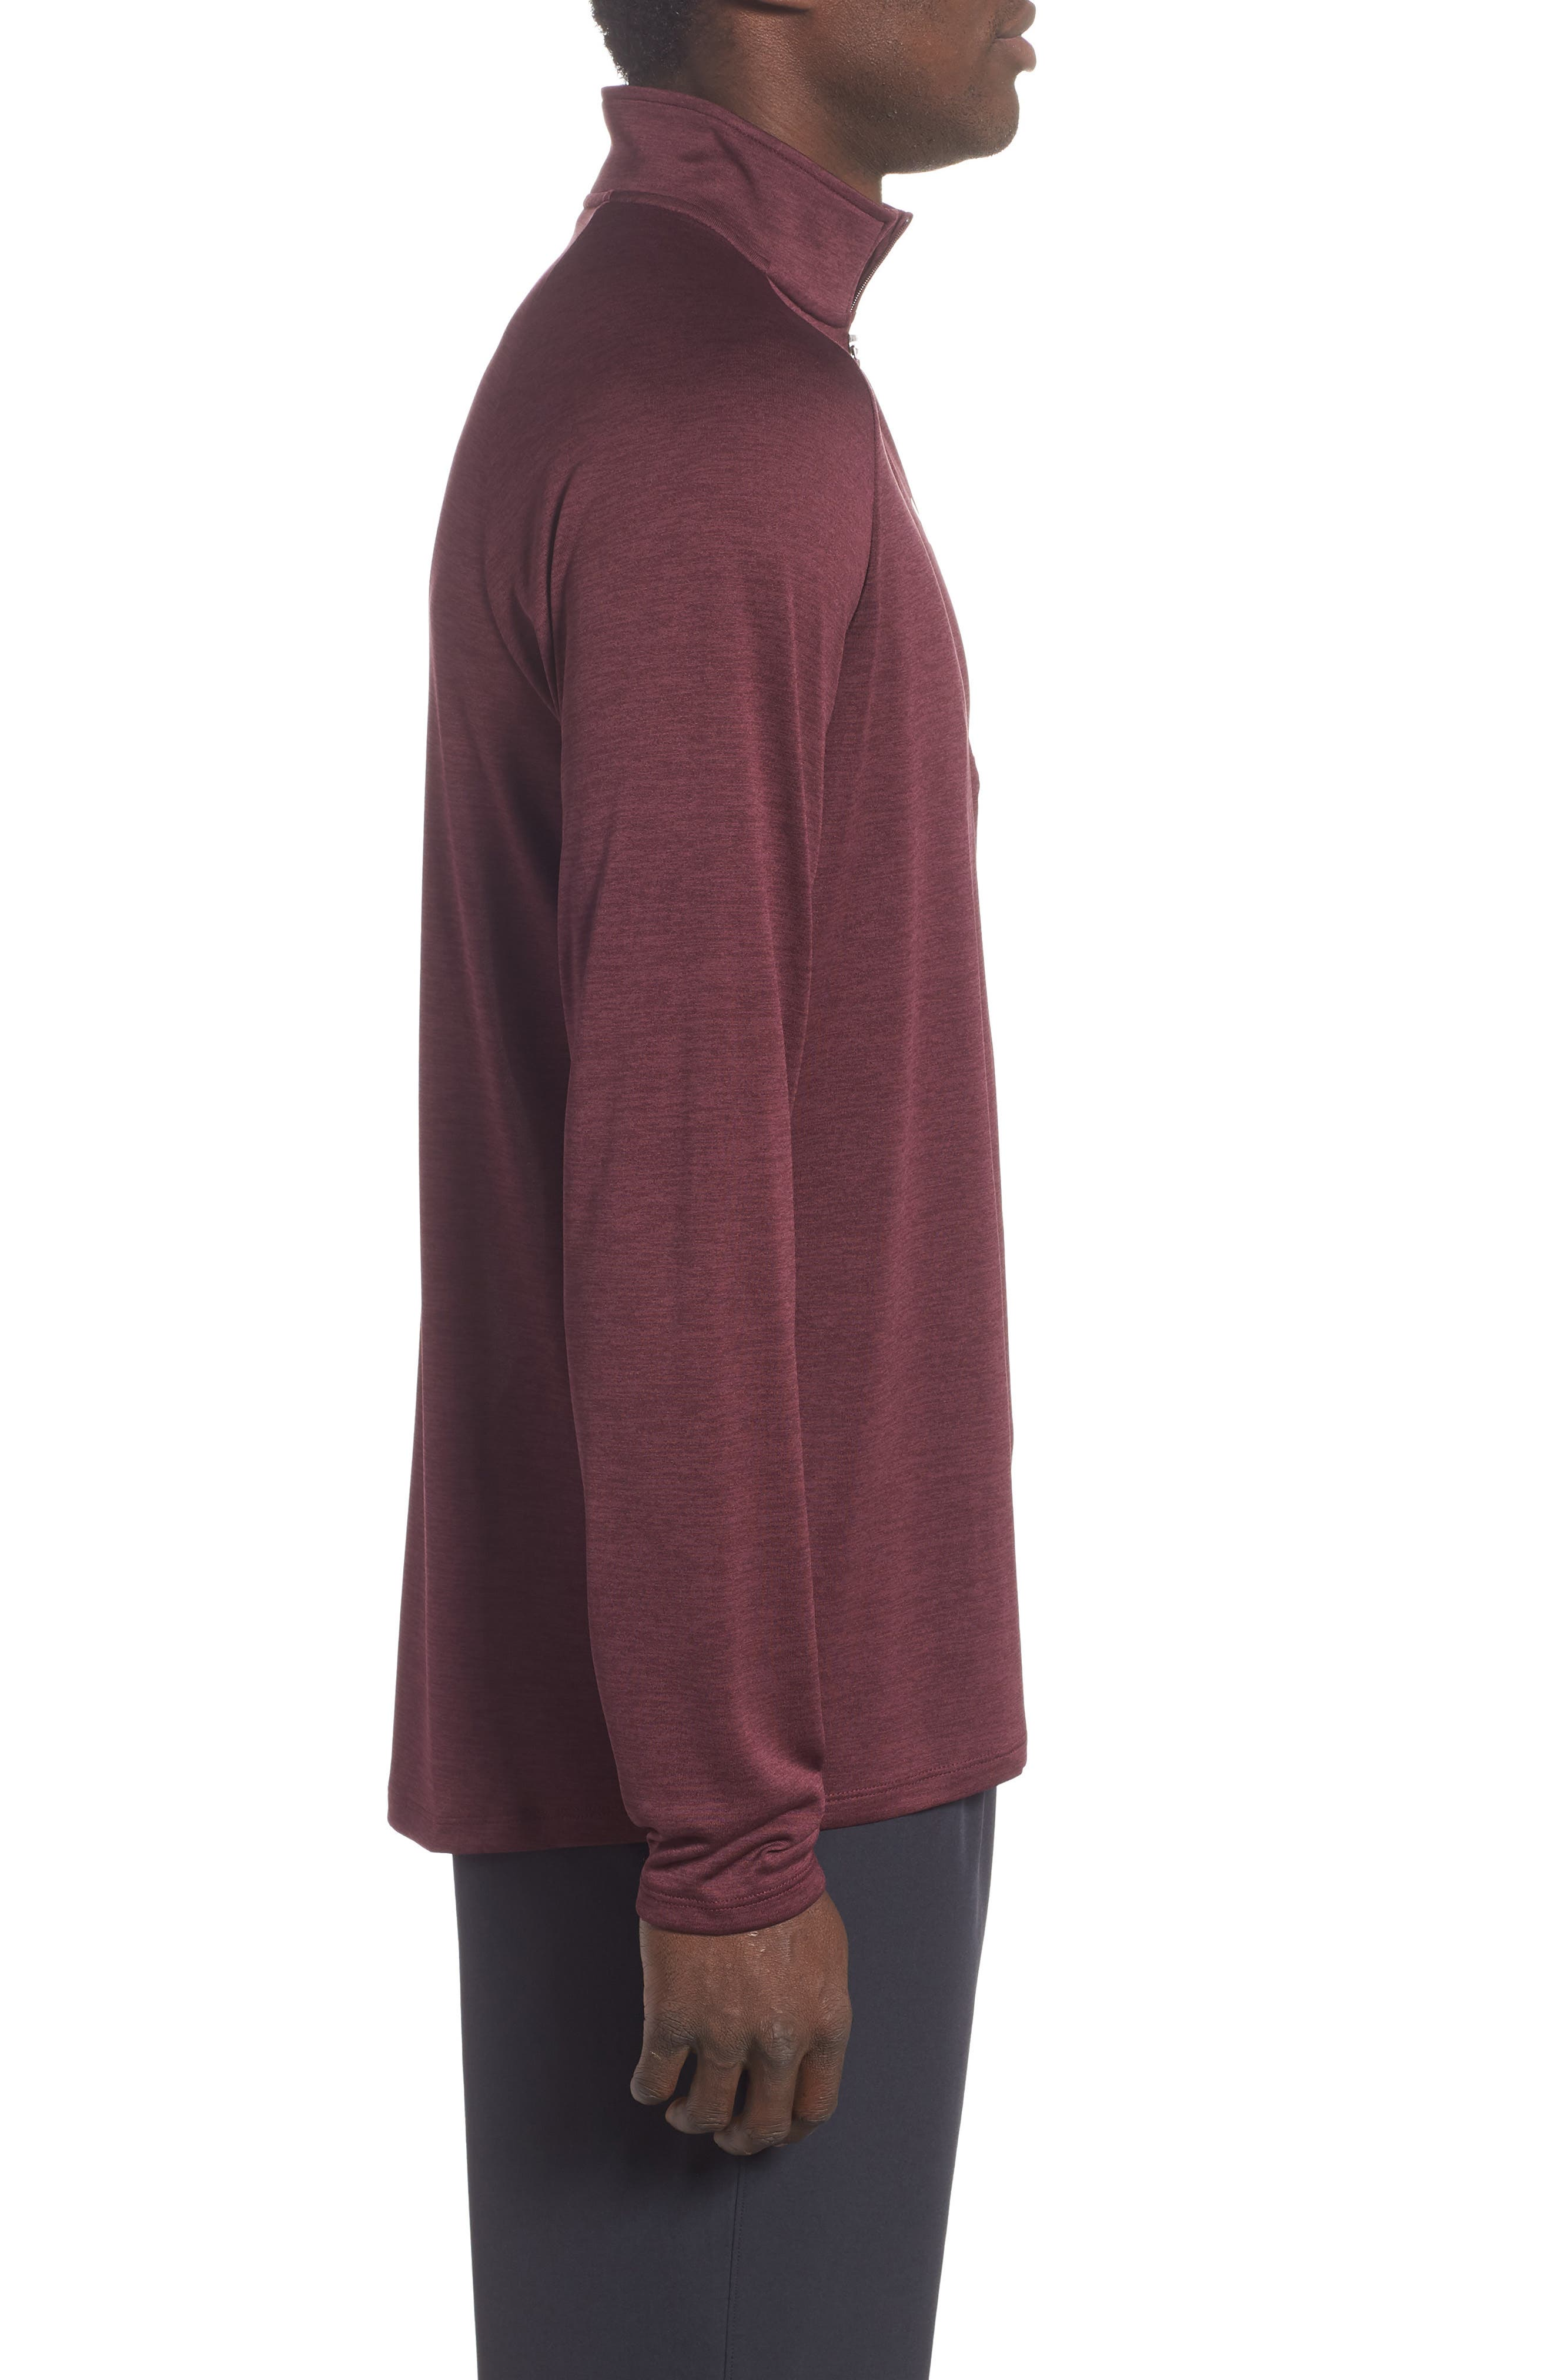 UNDER ARMOUR,                             Tech Half Zip Sweatshirt,                             Alternate thumbnail 3, color,                             600